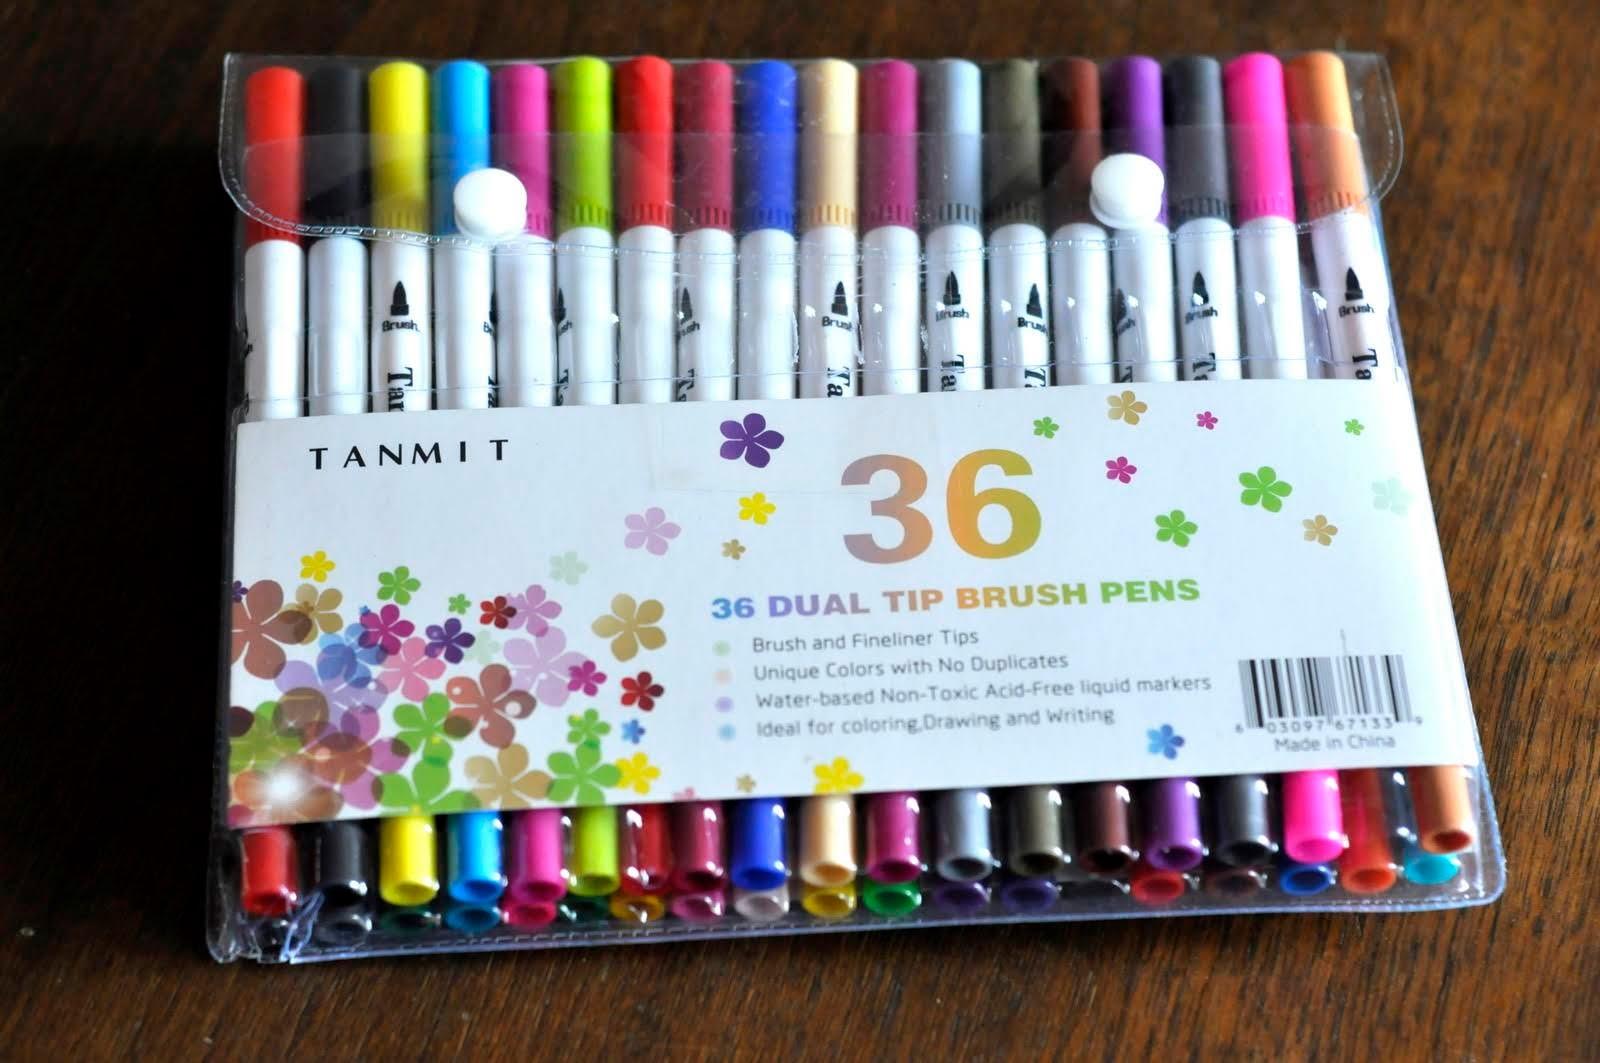 Tanmit-Dual-Tip-Brush-Pens-tasteasyougo.com